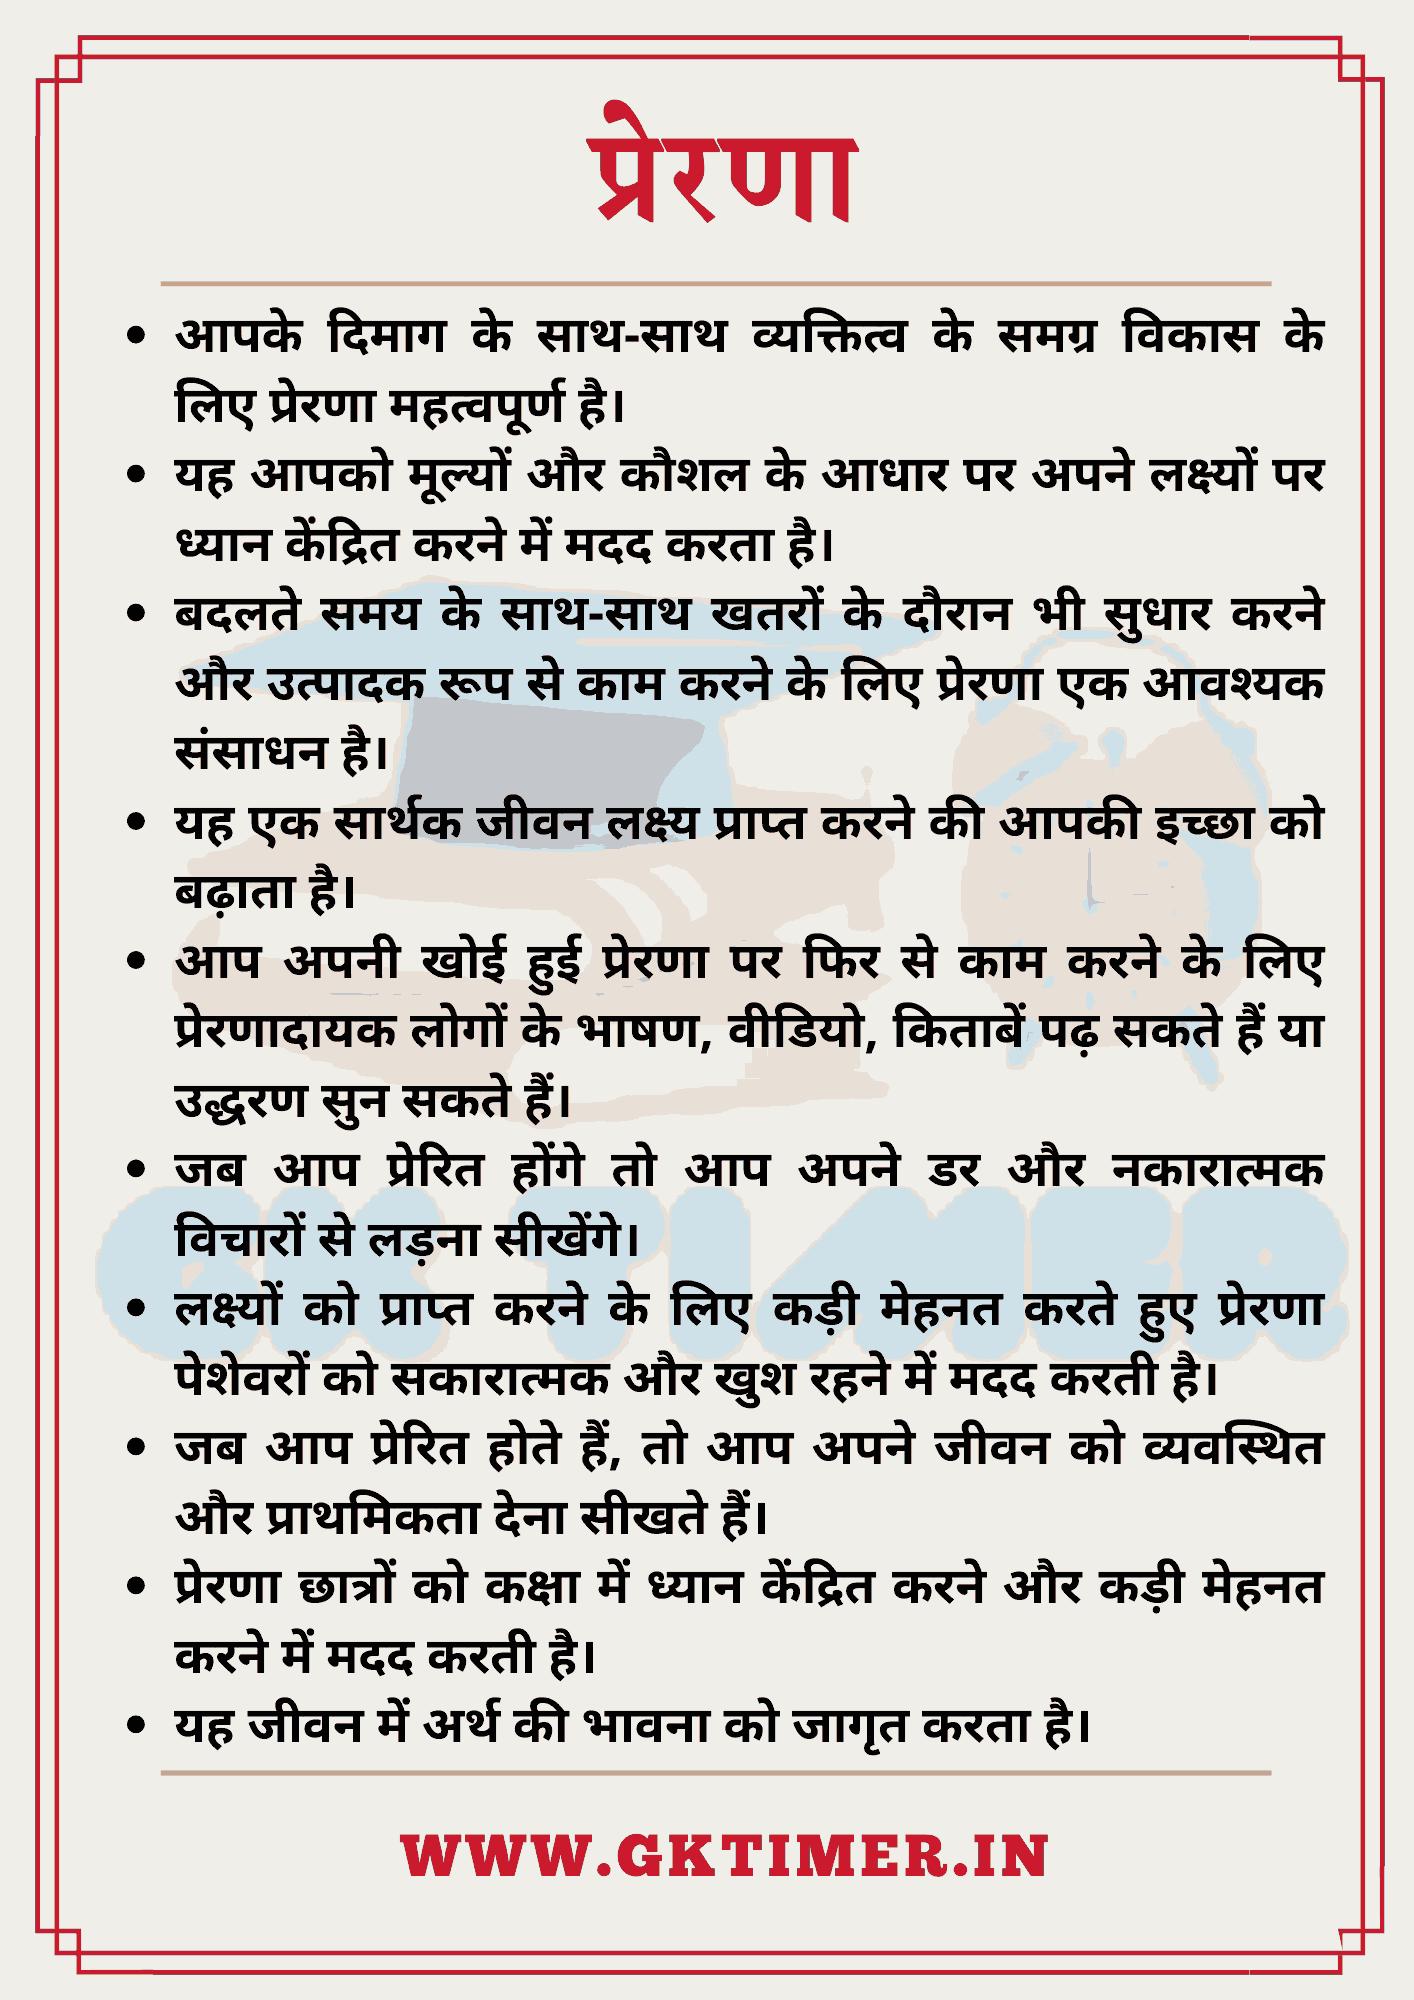 प्रेरणा पर निबंध | Essay on Motivation in Hindi | 10 Lines on Motivation in Hindi